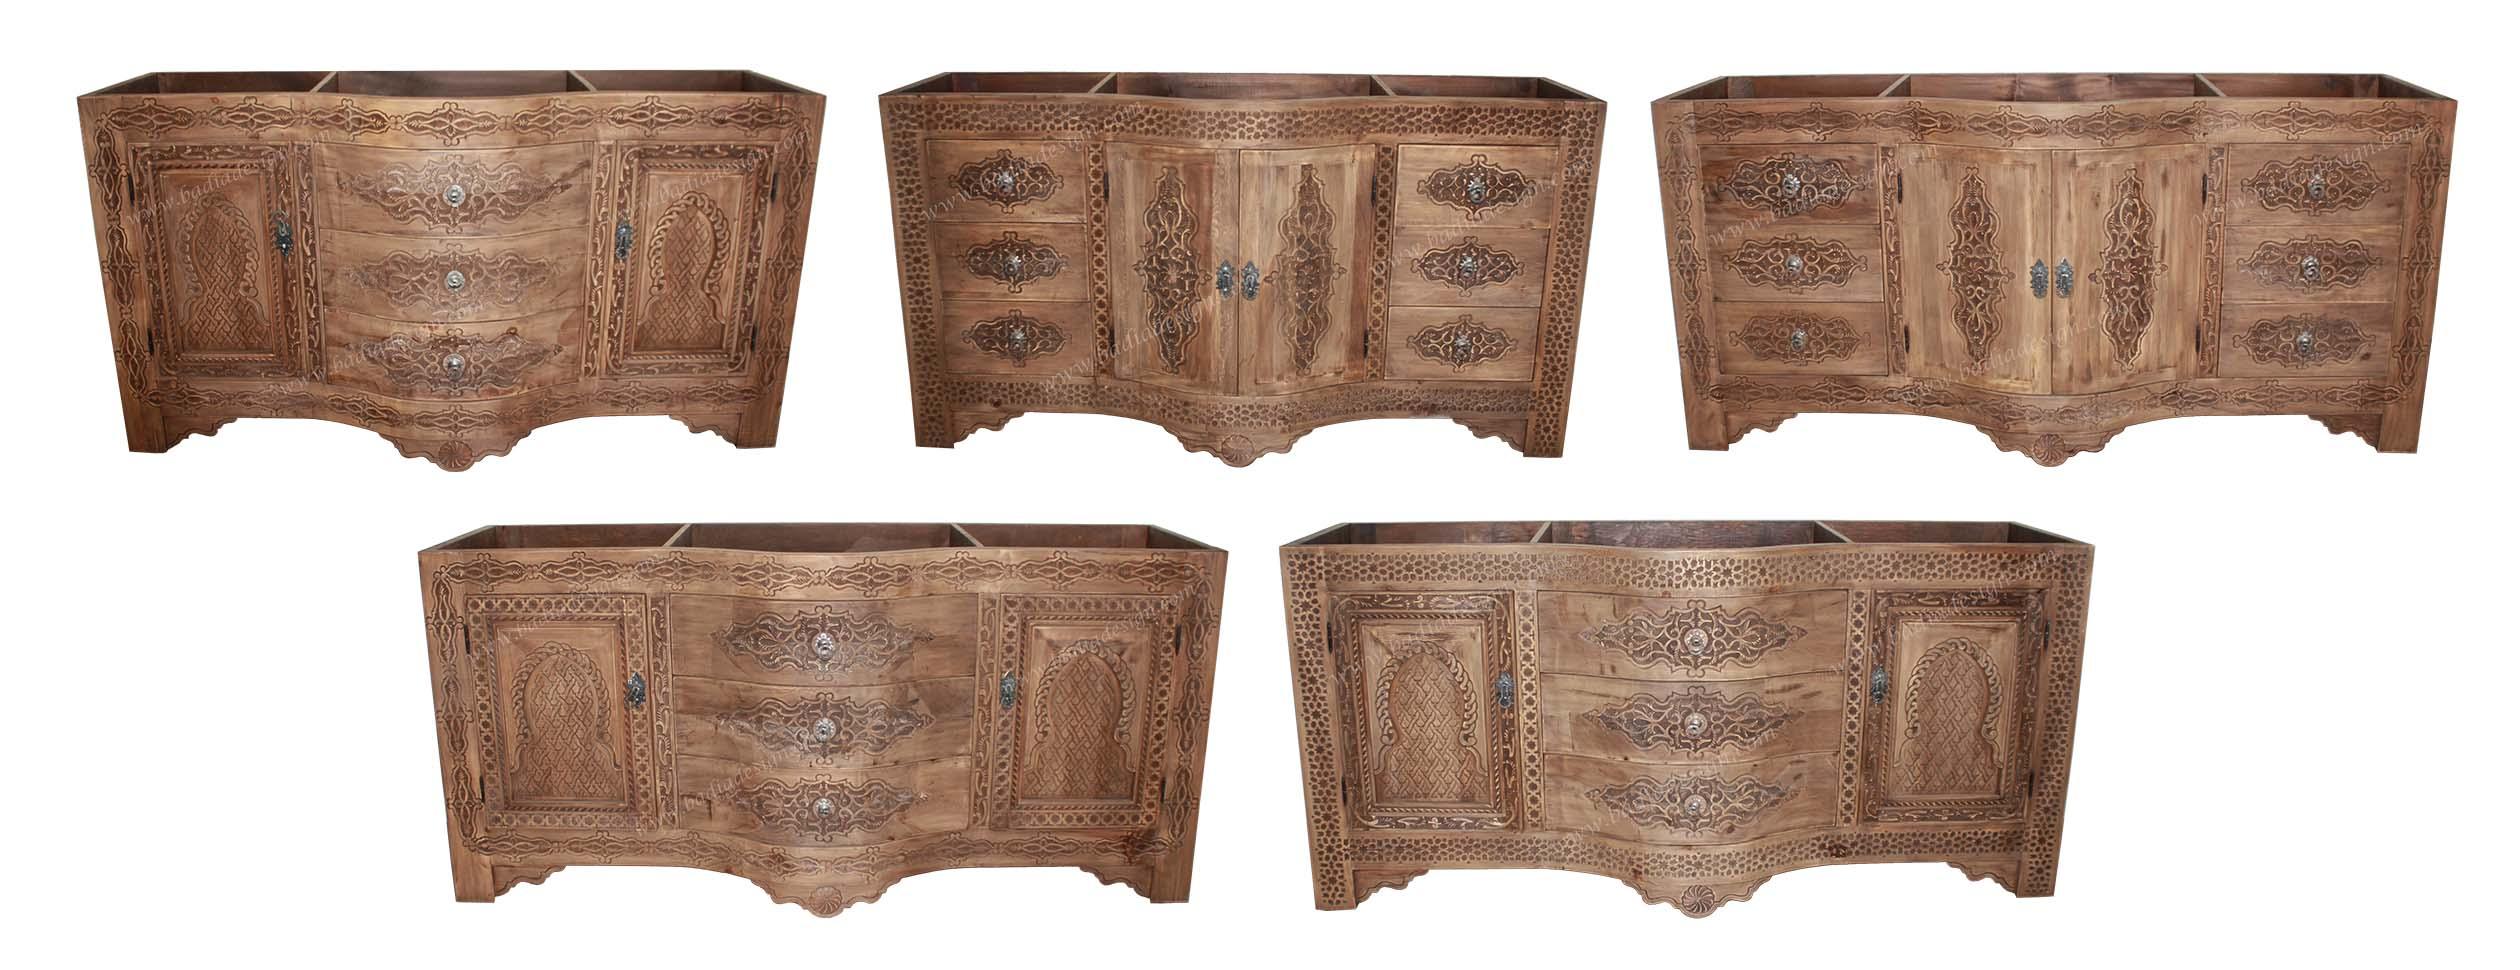 moroccan-wooden-bathroom-vanity-cw-ca047.jpg